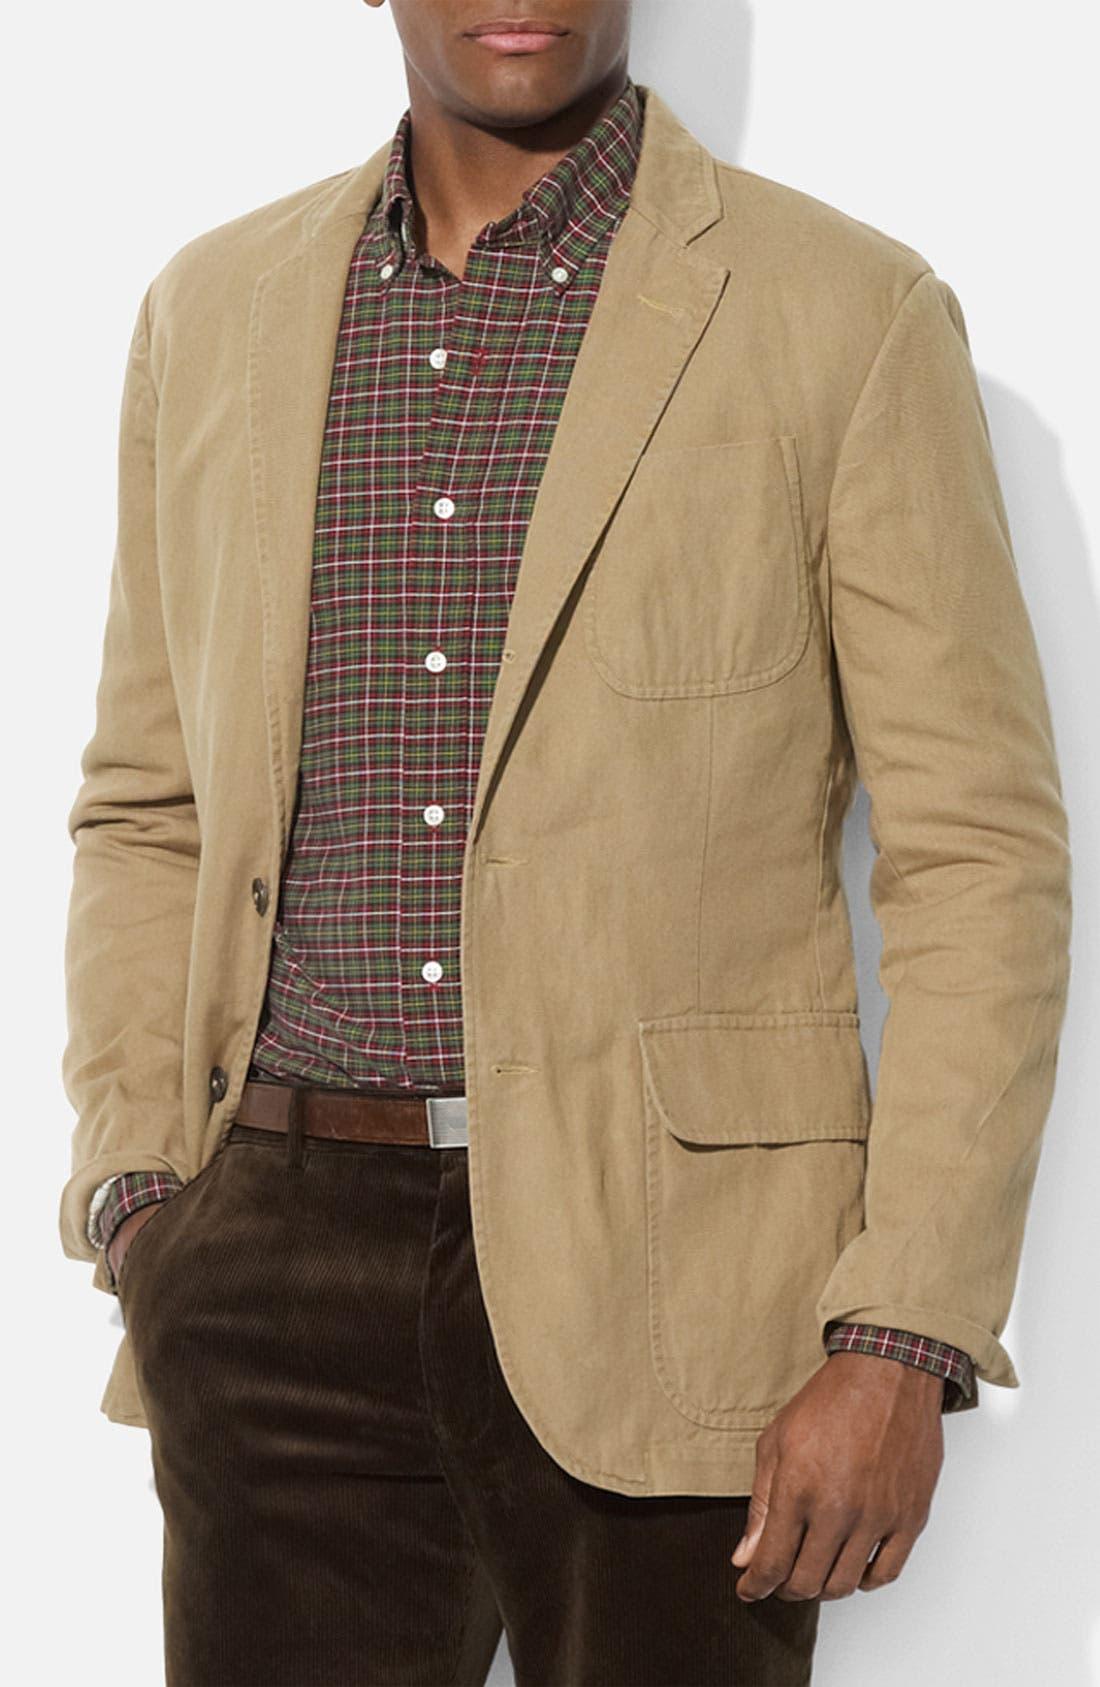 Main Image - Polo Ralph Lauren Cotton & Linen Sportcoat